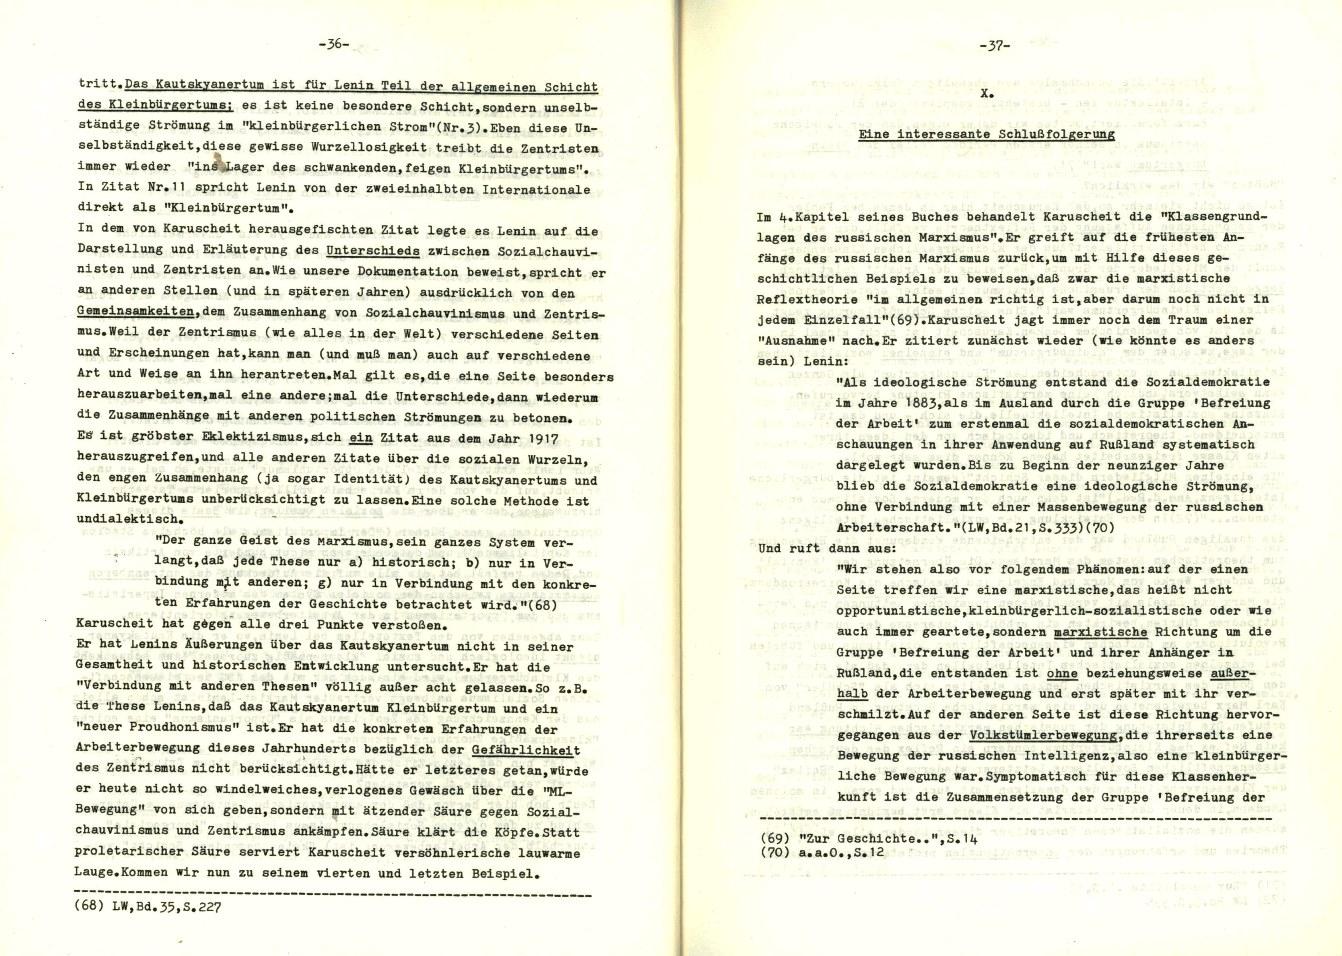 Muenchen_Kampf_dem_Revisionismus_1979_09_19